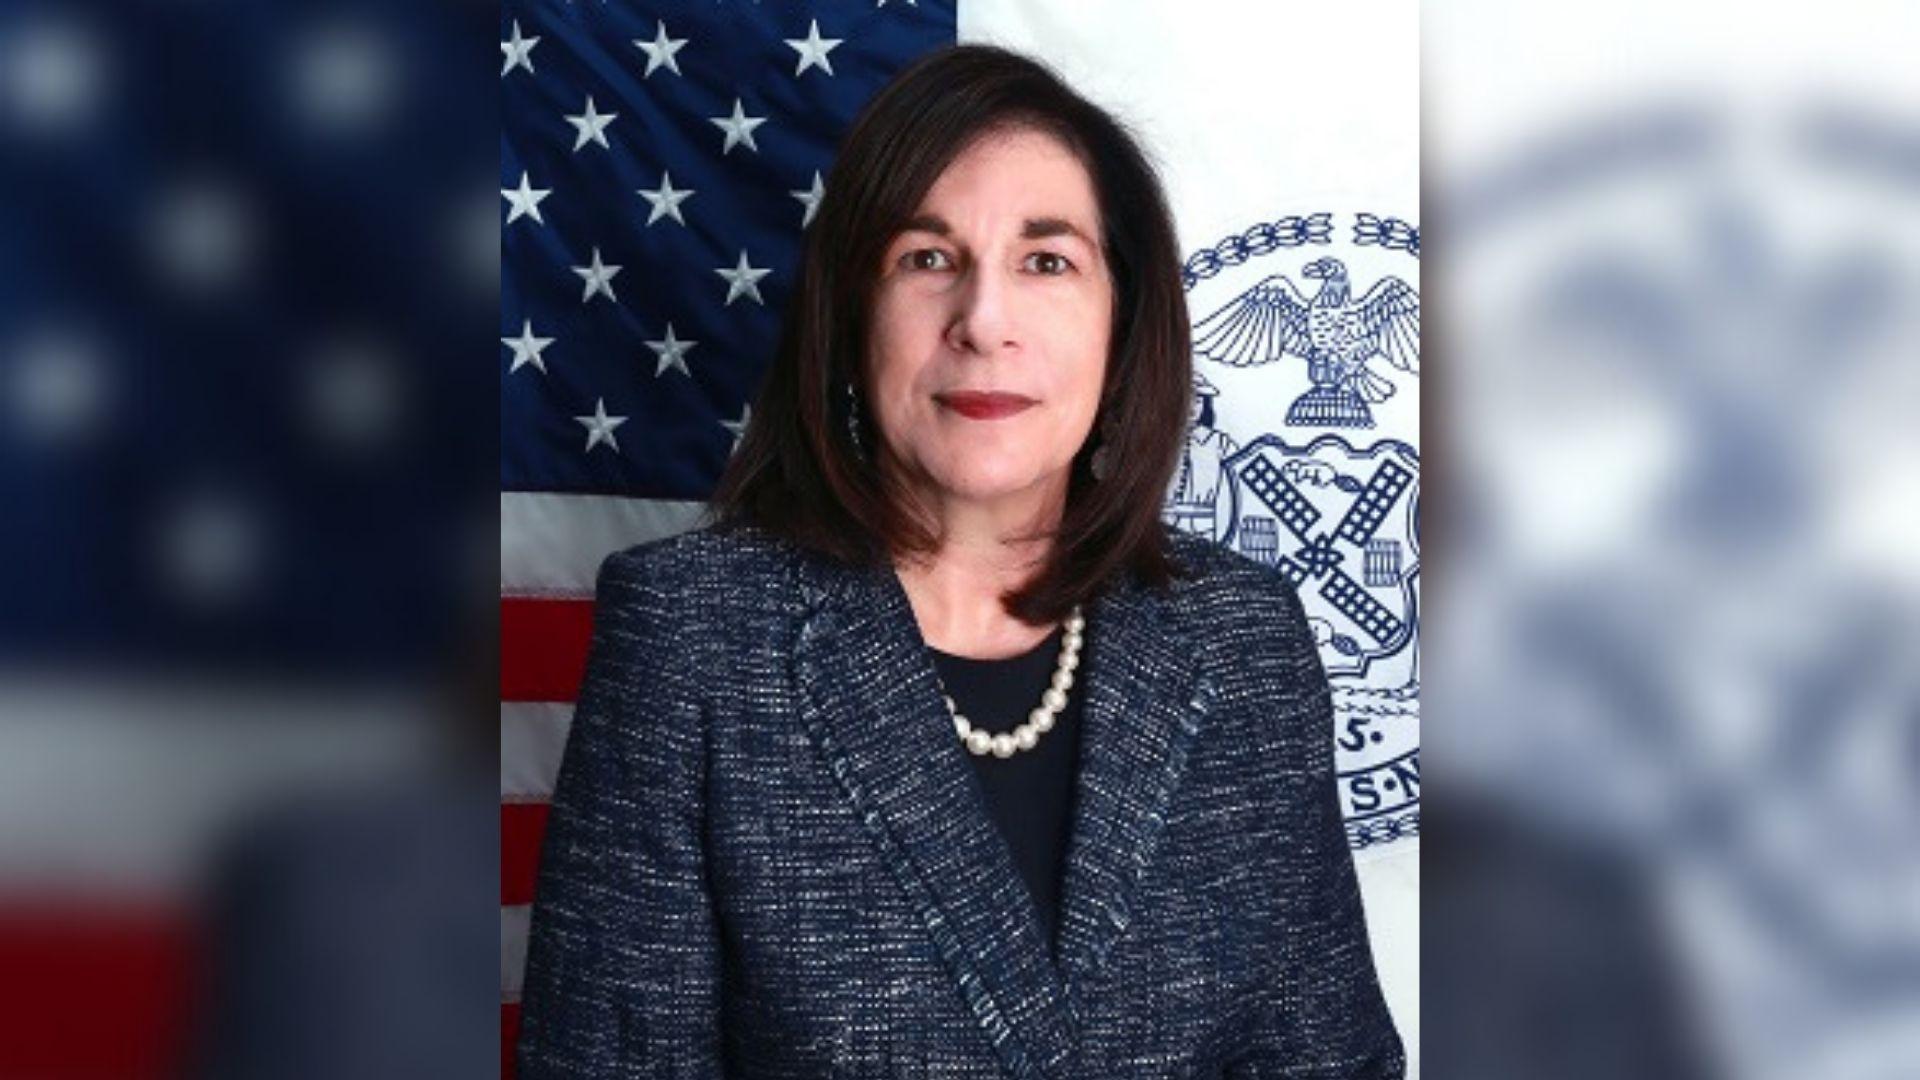 New York City Department of Correction Commissioner Cynthia Brann